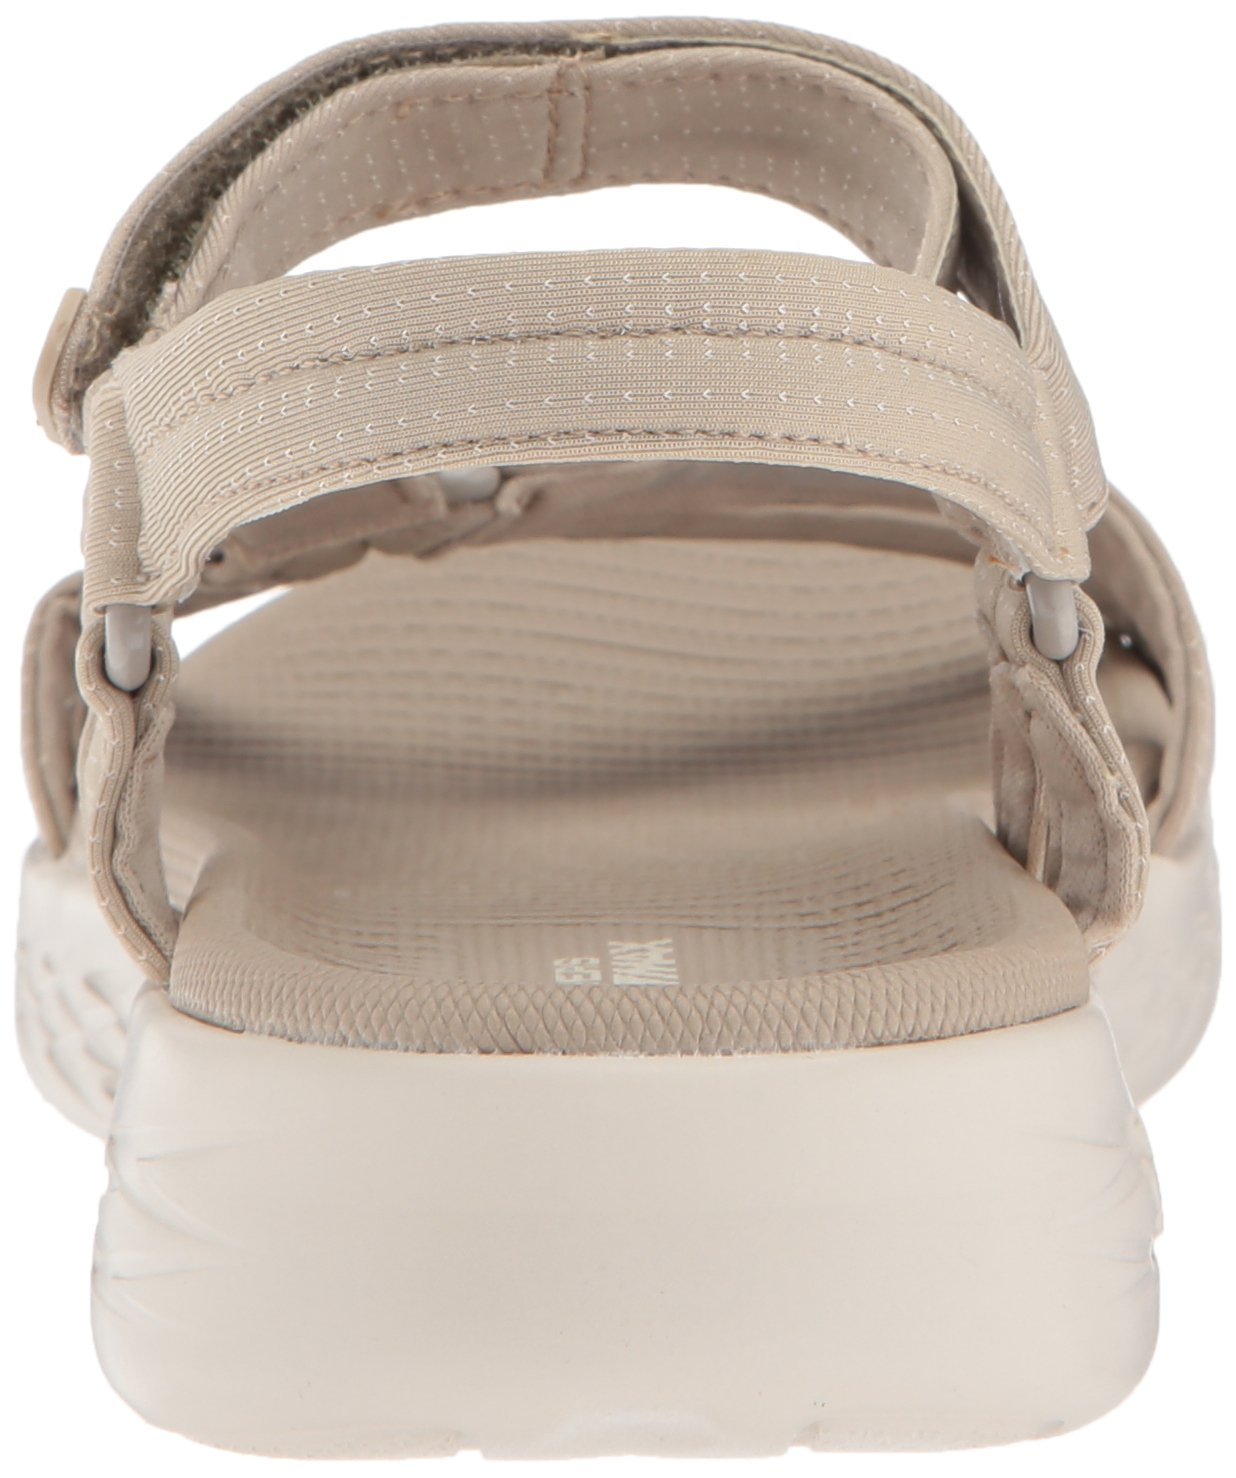 Skechers Women's on-The-Go 600-Brilliancy Sport Sandal B072T34MZY 7 B(M) US|Natural